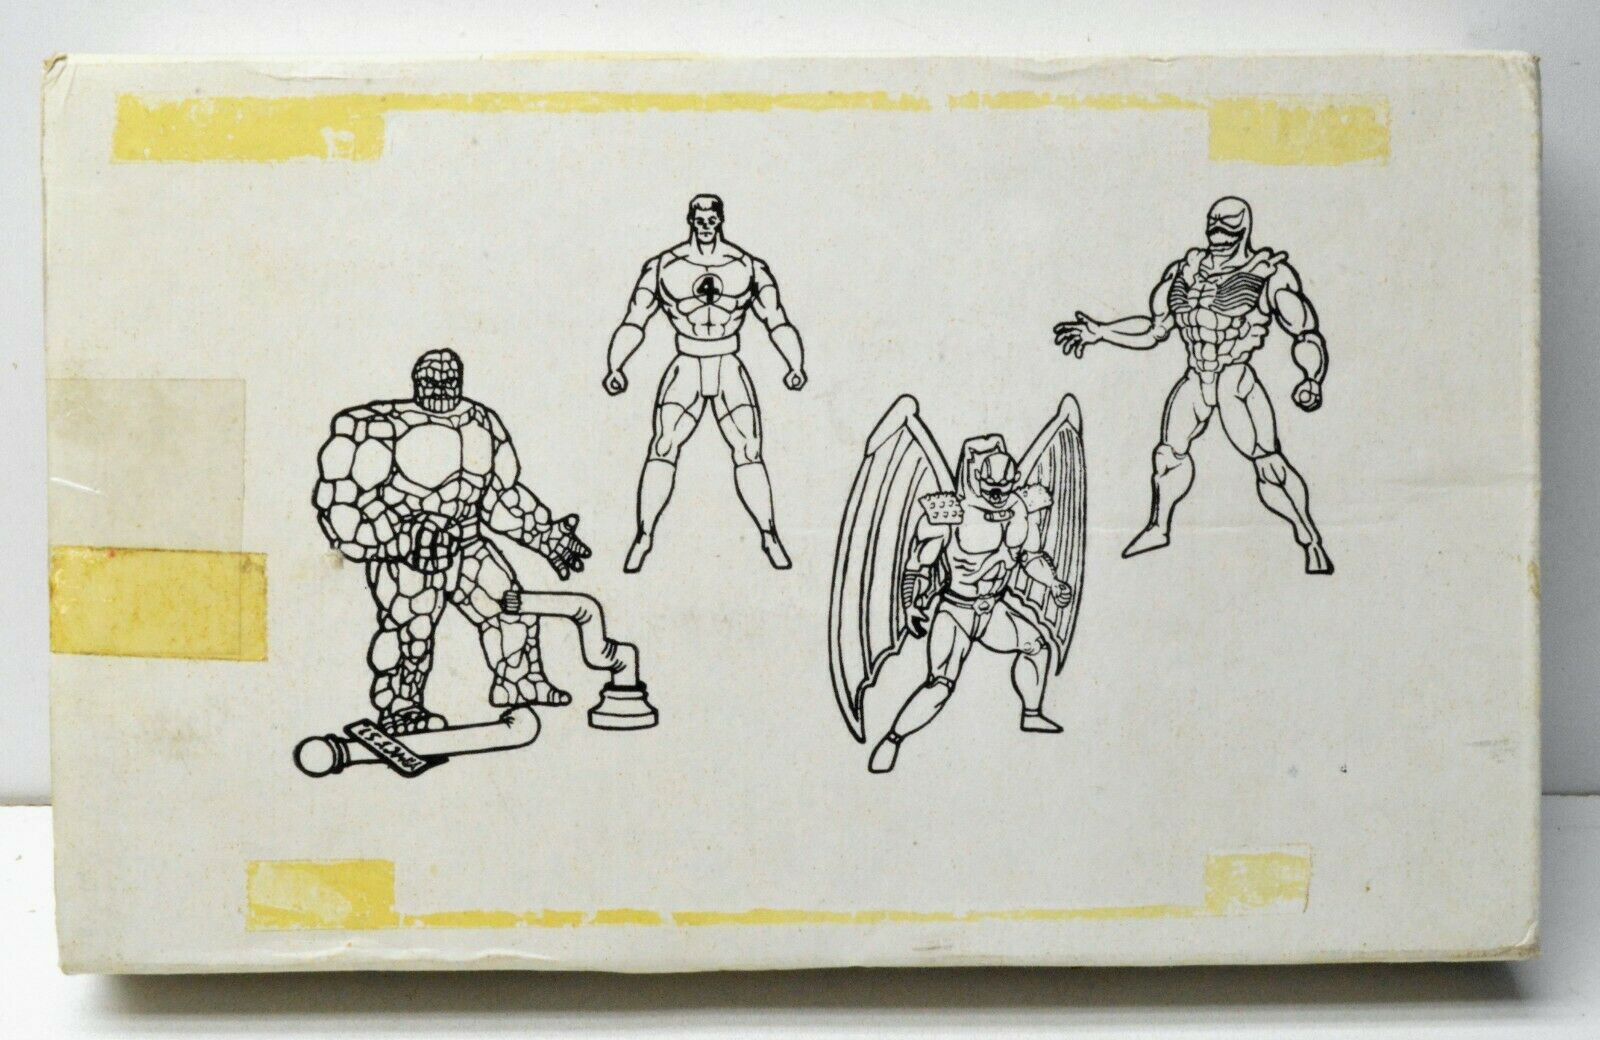 ToyBiz Marvel Super Heroes Mail Mail Mail Away Action Figure Set Thing Venom Annihilus 7d40f4